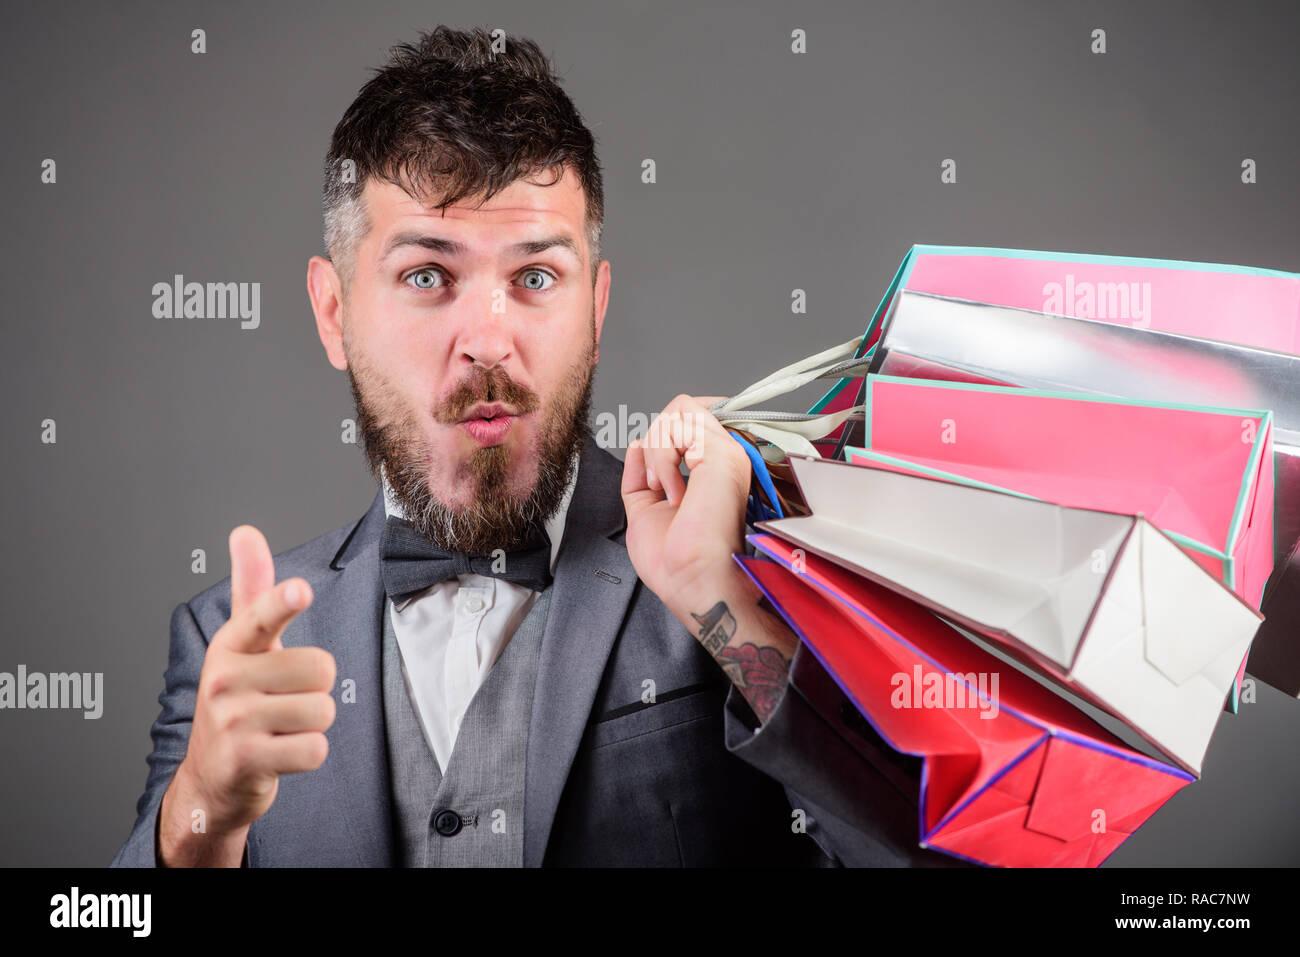 Elite boutique. Make shopping more joyful. Man bearded elegant businessman carry shopping bags on grey background. Enjoy shopping profitable deals black friday. Shopping with discount enjoy purchase. - Stock Image